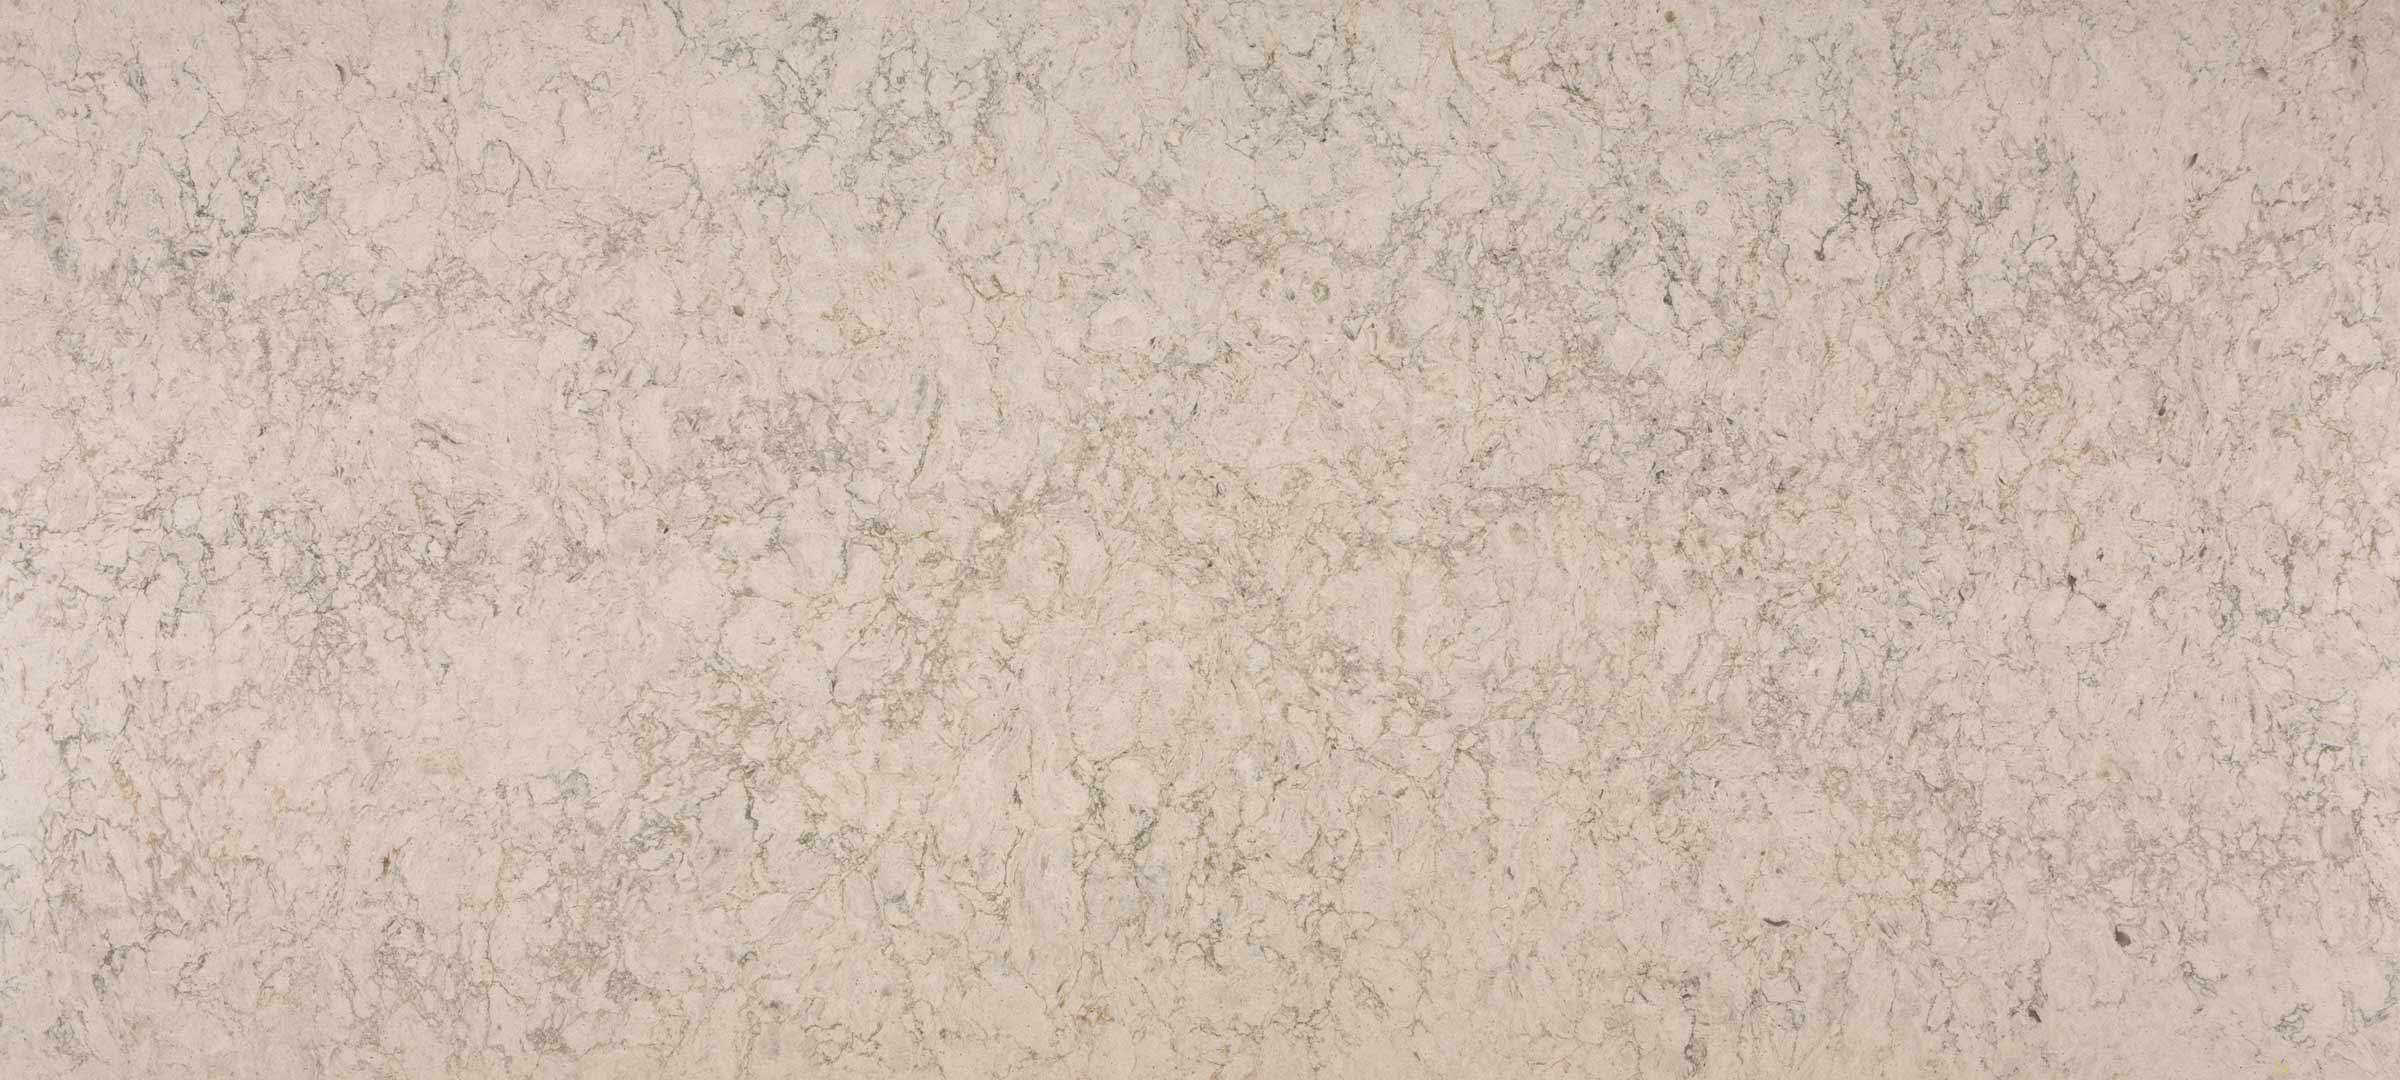 caesarstone quartz gallery countertops slabs st. Black Bedroom Furniture Sets. Home Design Ideas